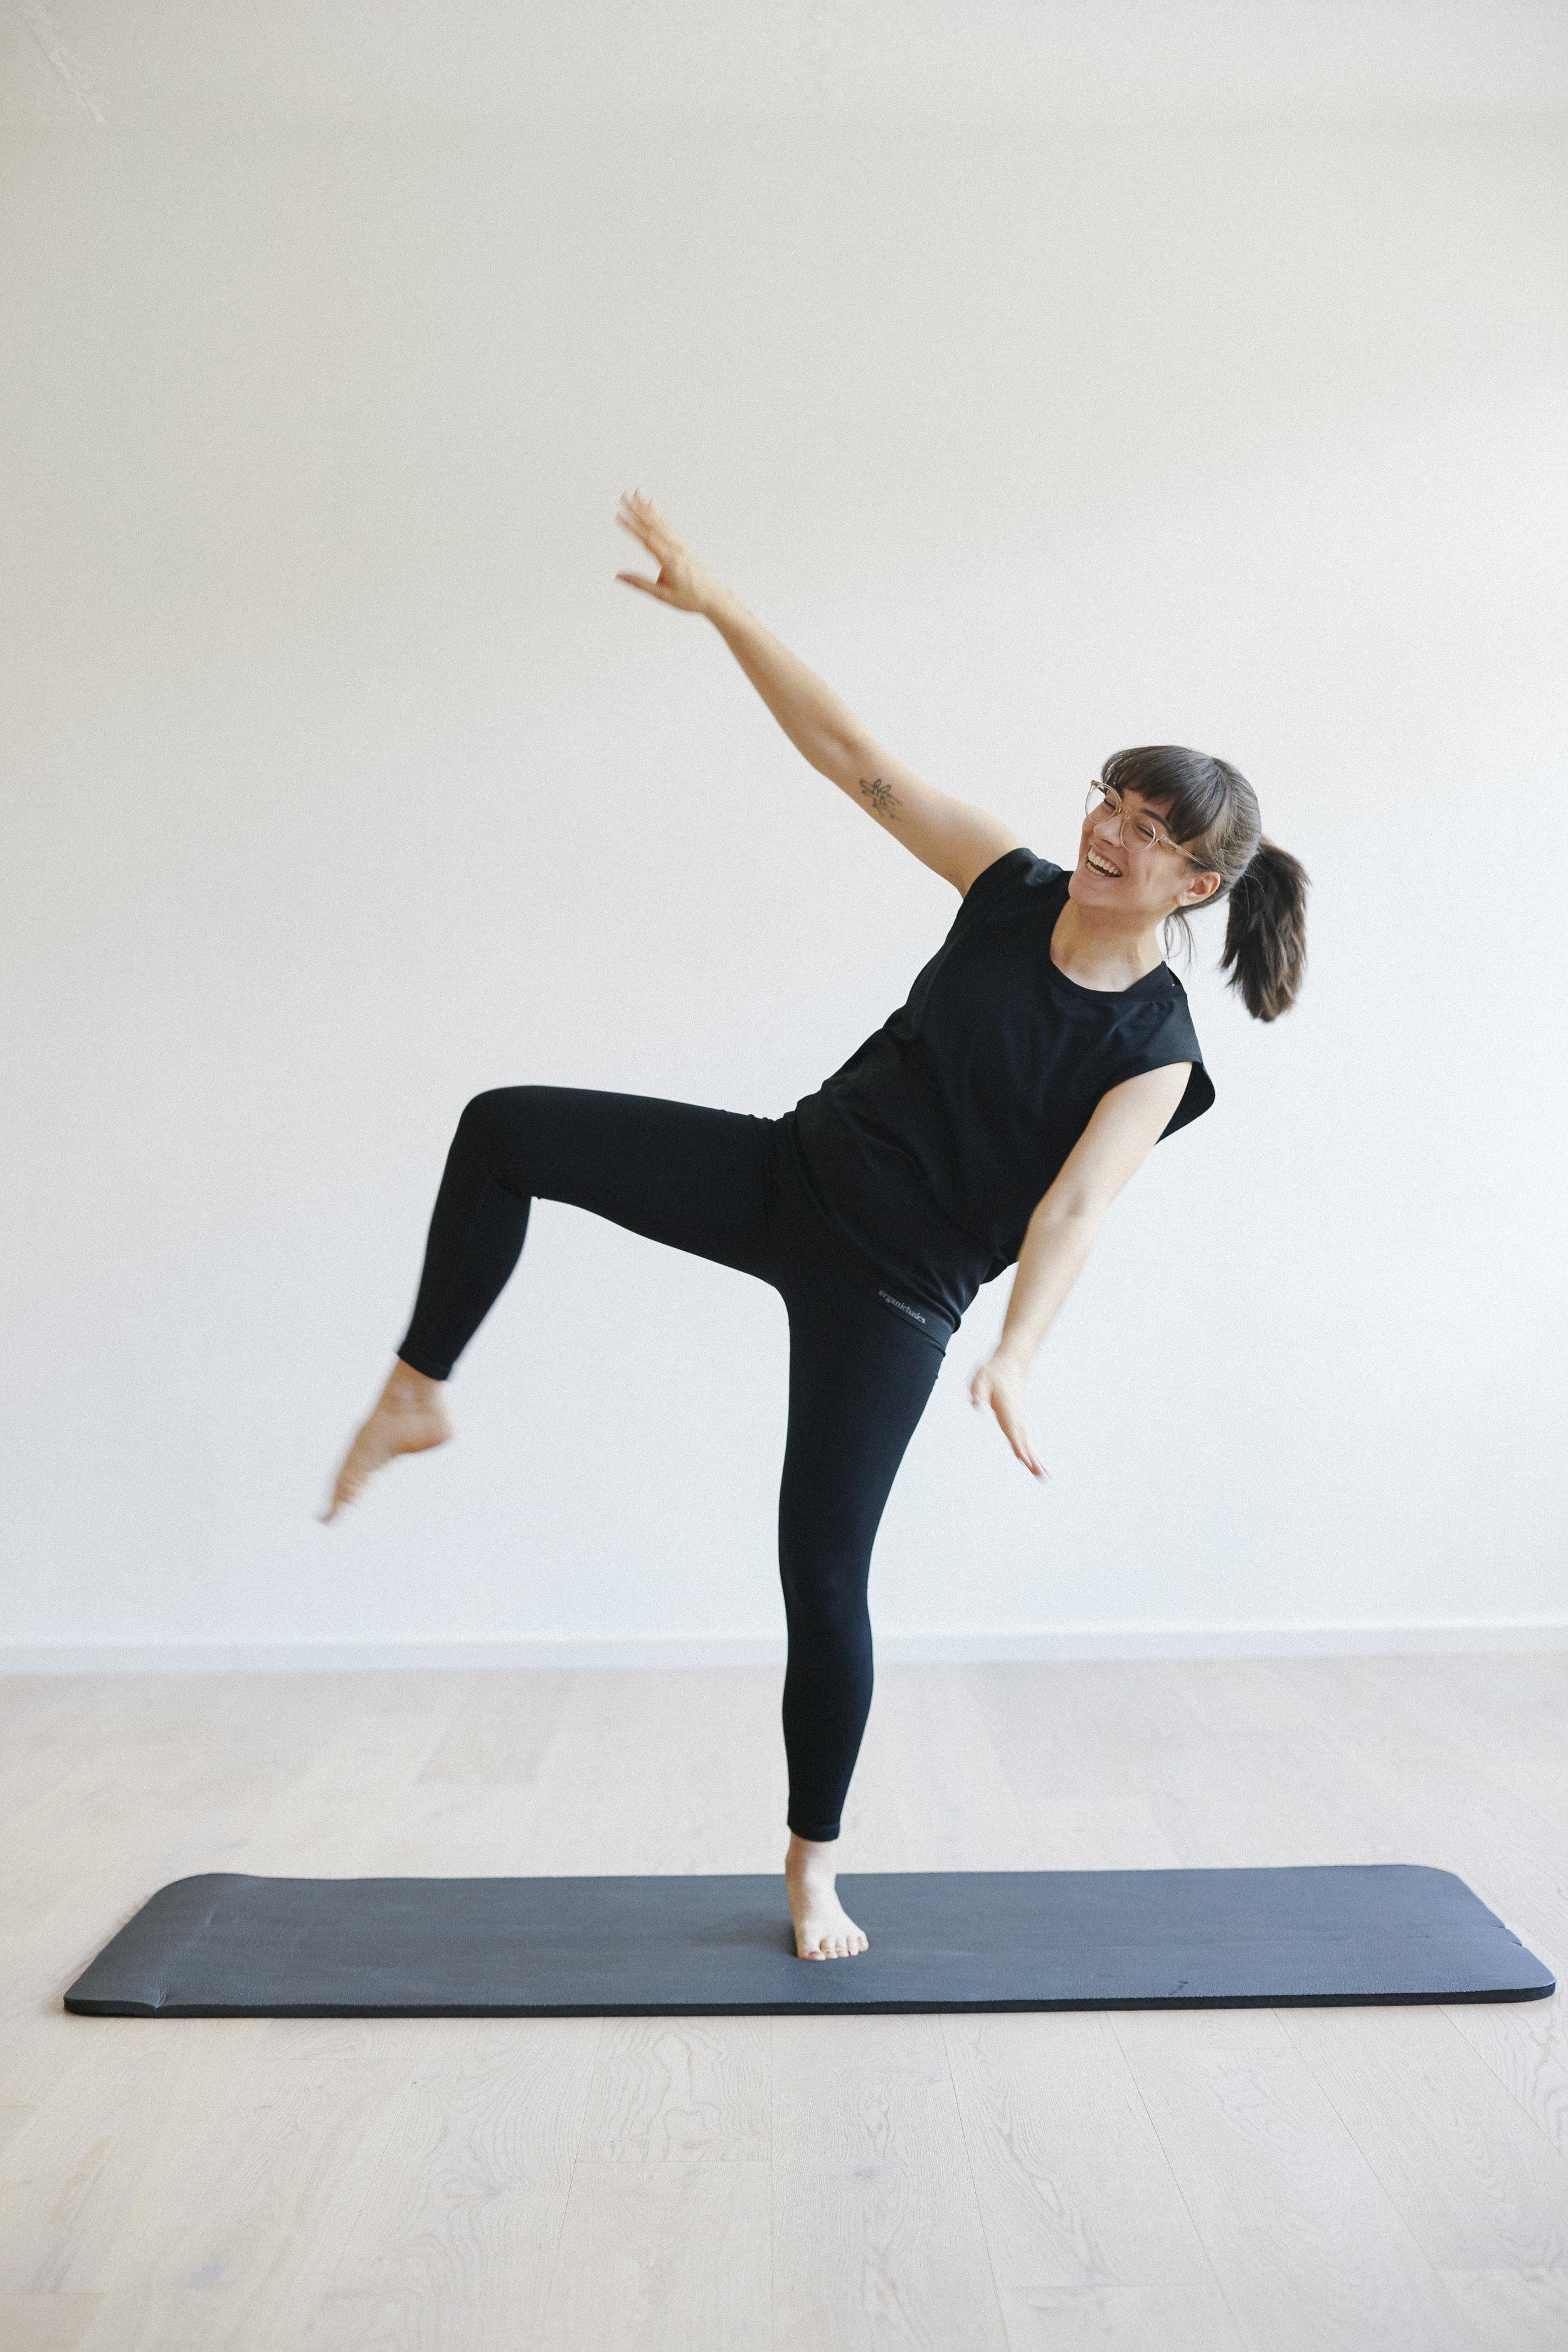 2019_06_07_Organic Basicy Yoga_008_VSCO.JPG